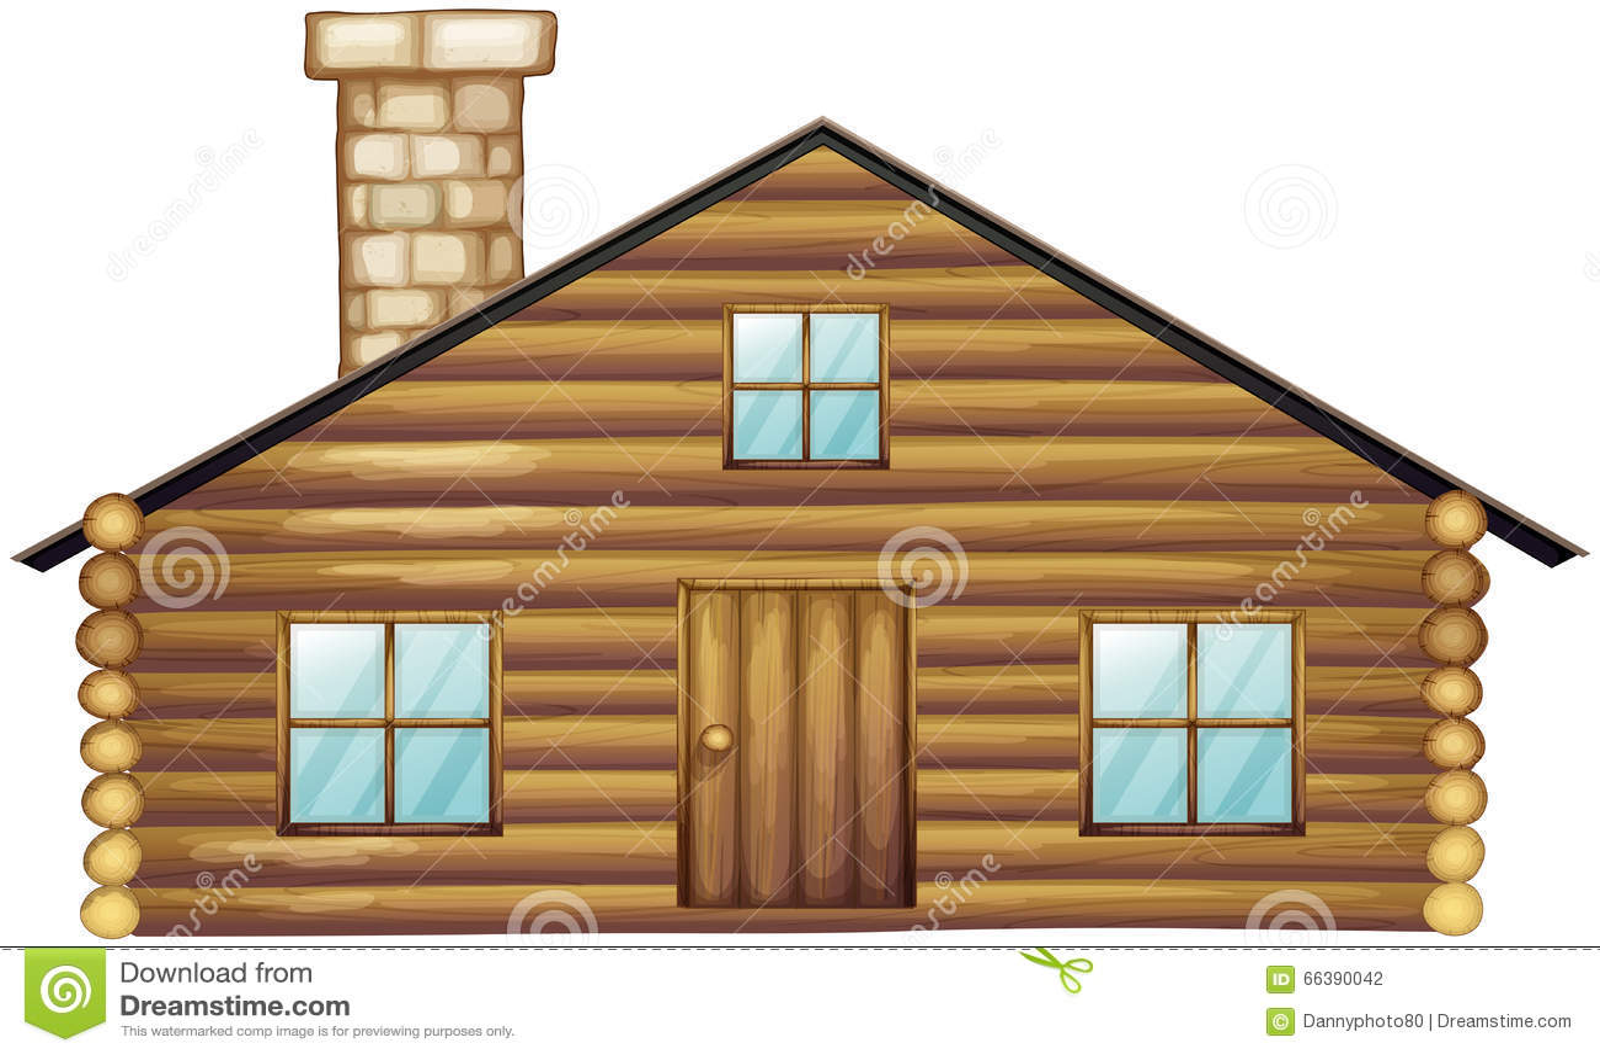 Chimenea madera de madera para chimenea purline chimenea - Chimeneas para casas de madera ...